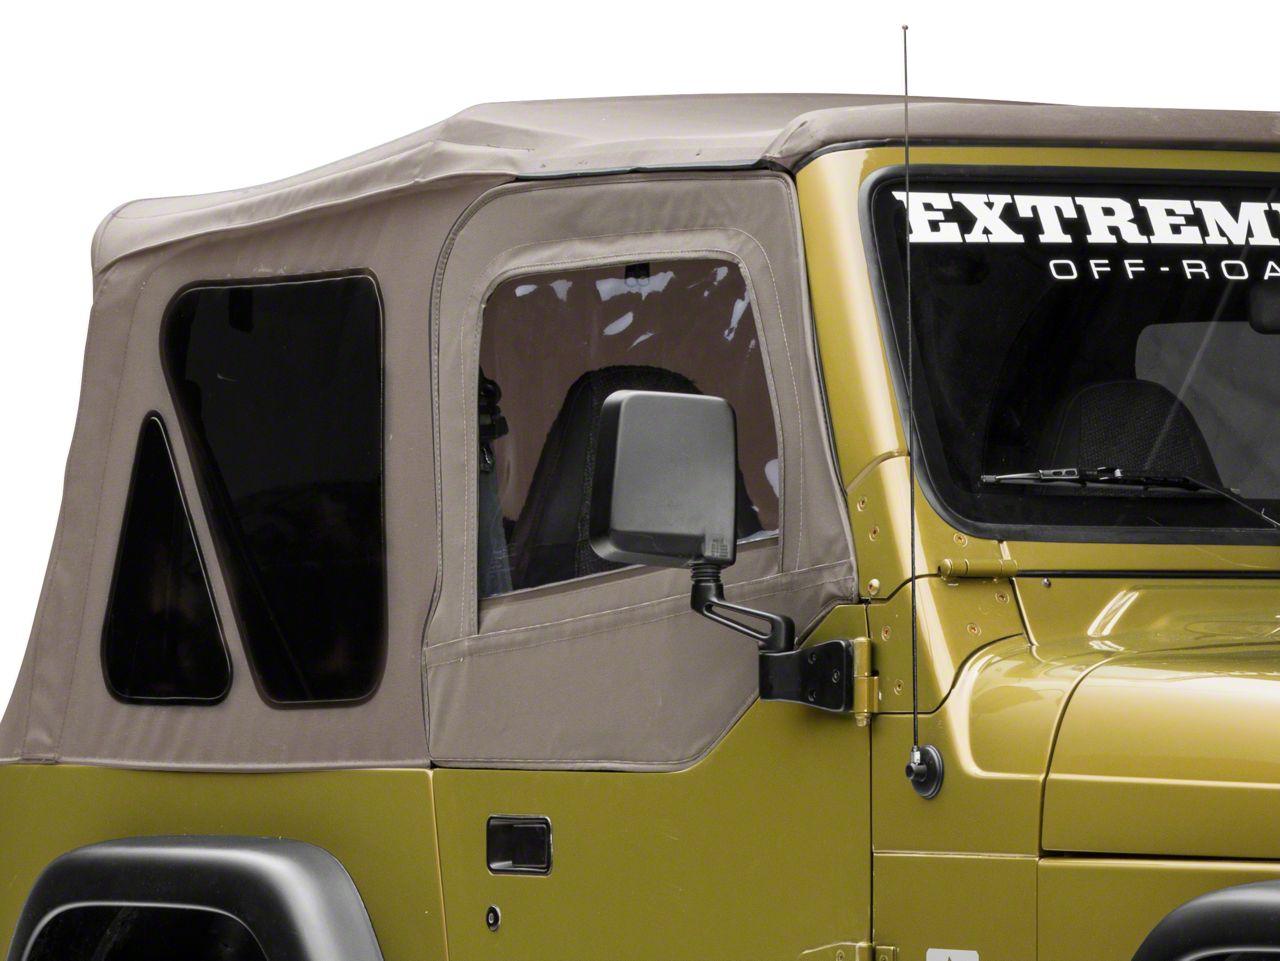 Rugged Ridge Upper Soft Door Kit - Khaki Denim (97-06 Jeep Wrangler TJ w/ Factory Soft Top)